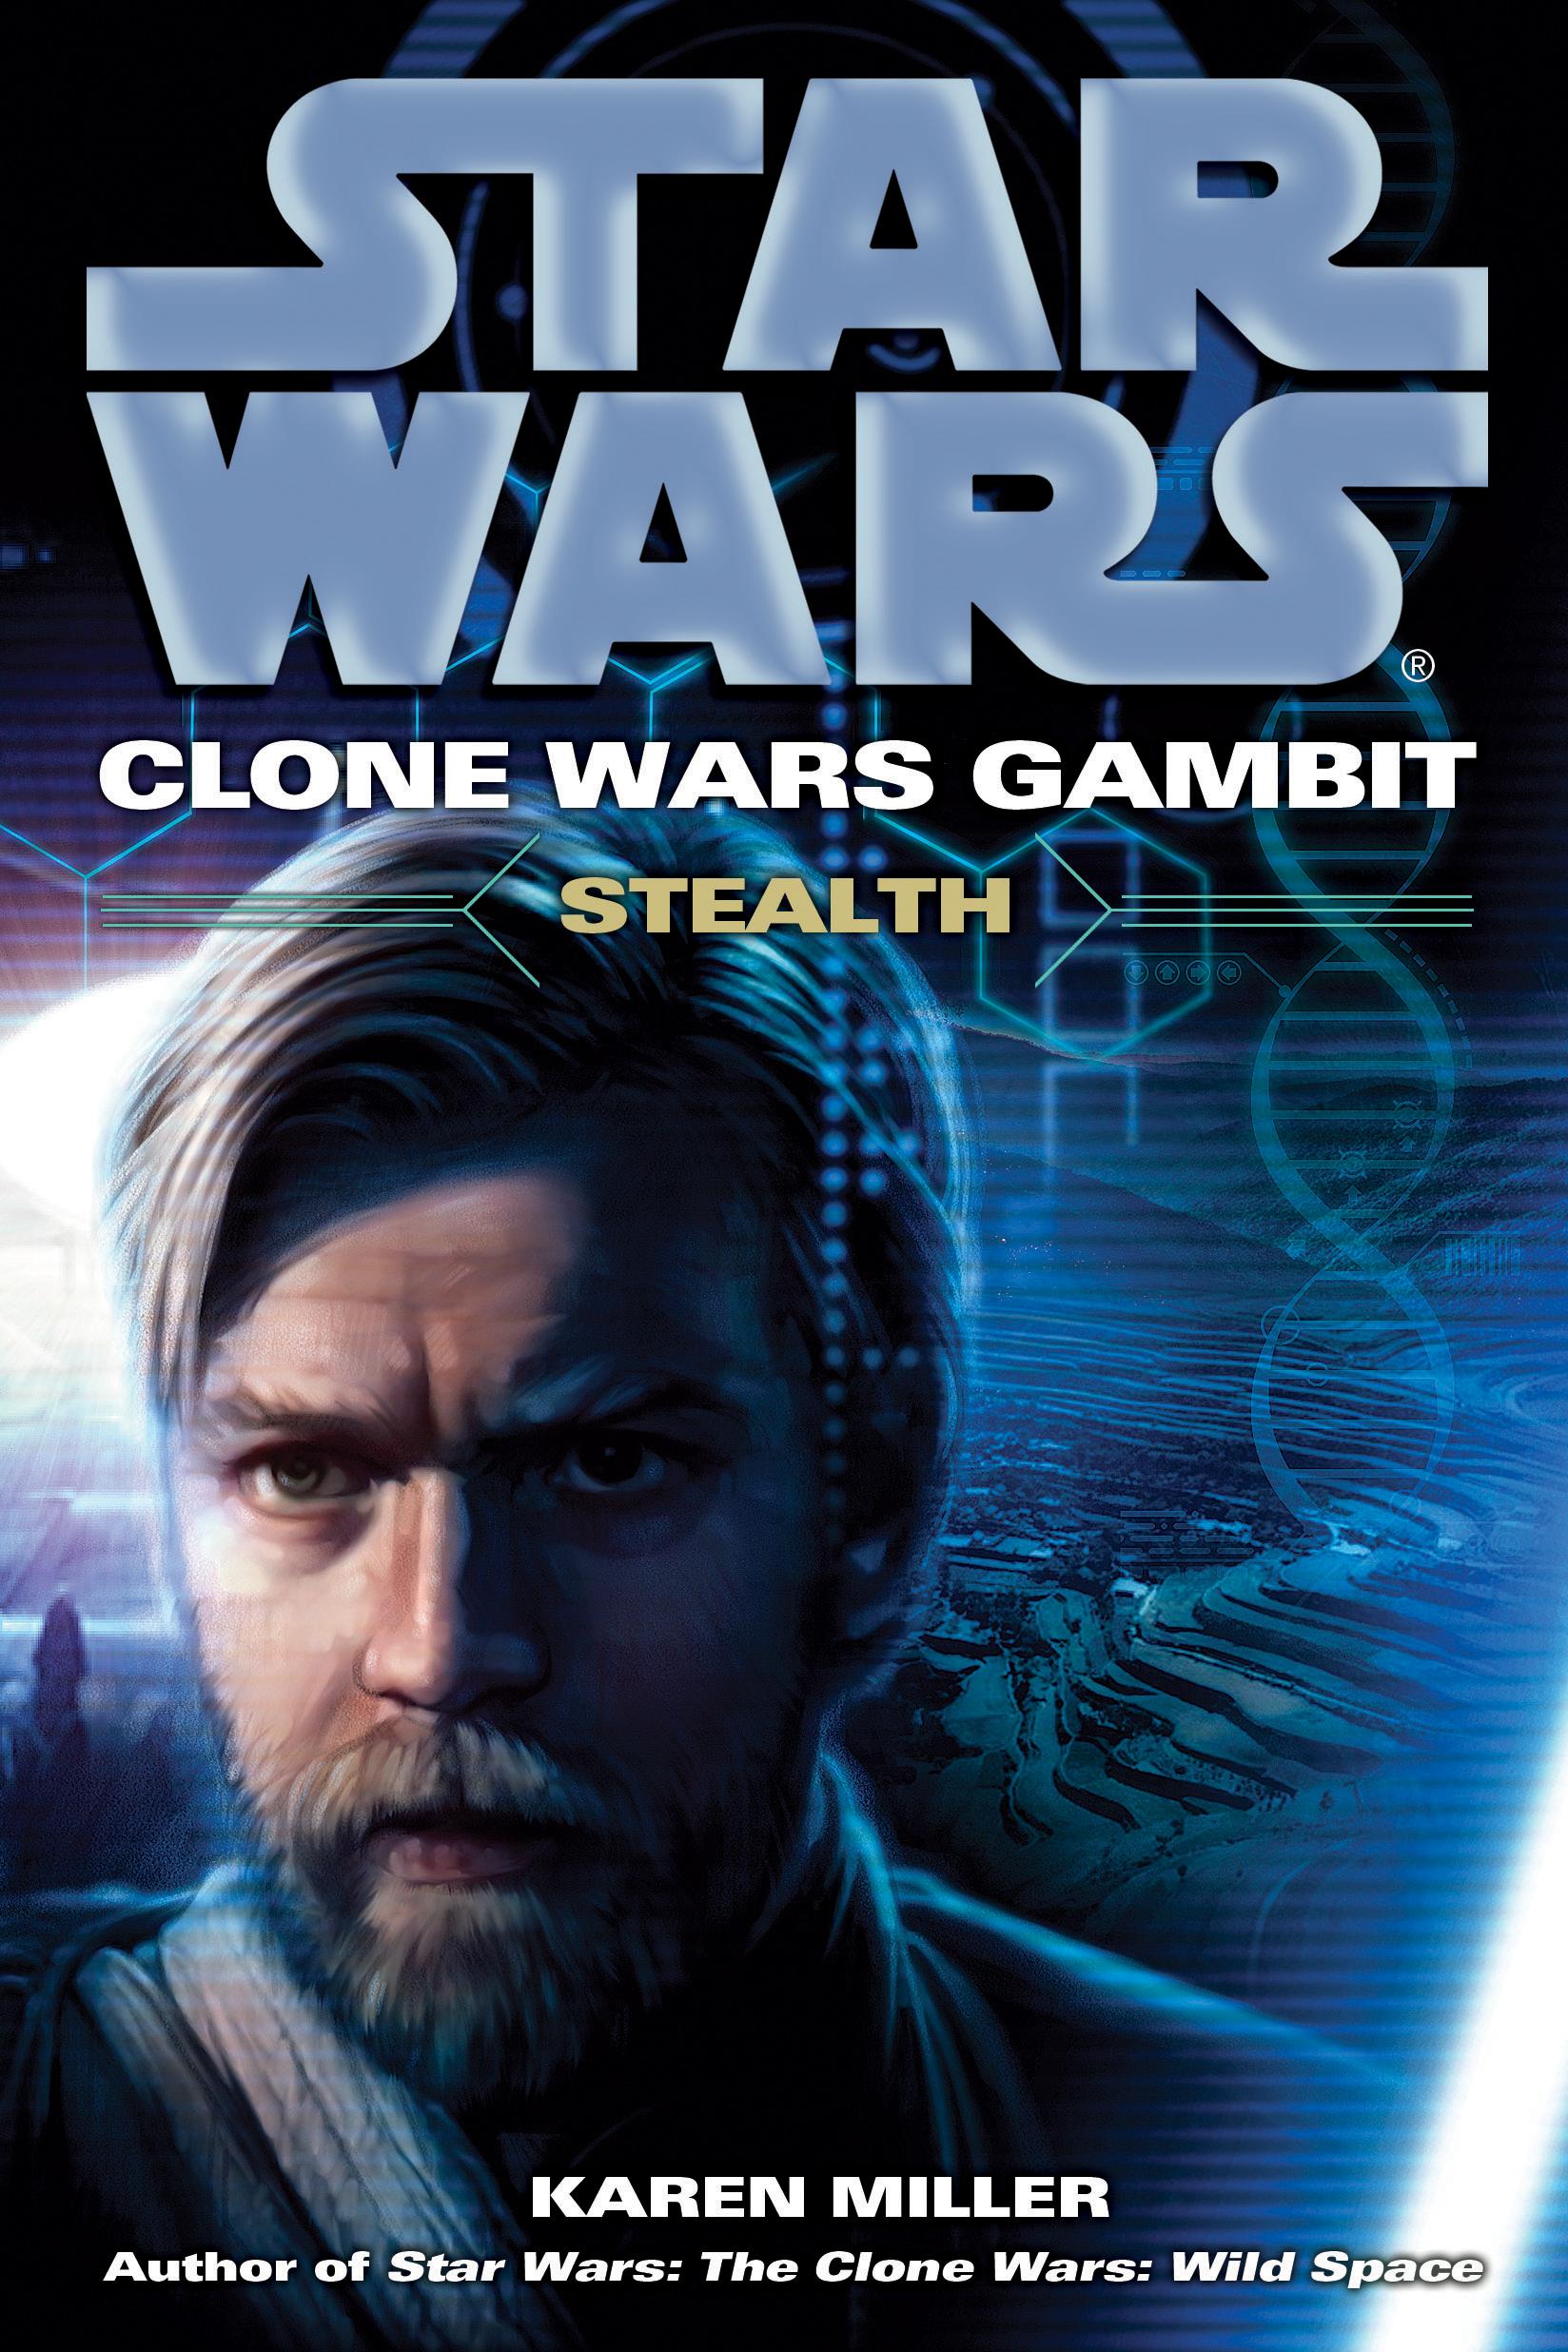 Star Wars: Clone Wars Gambit